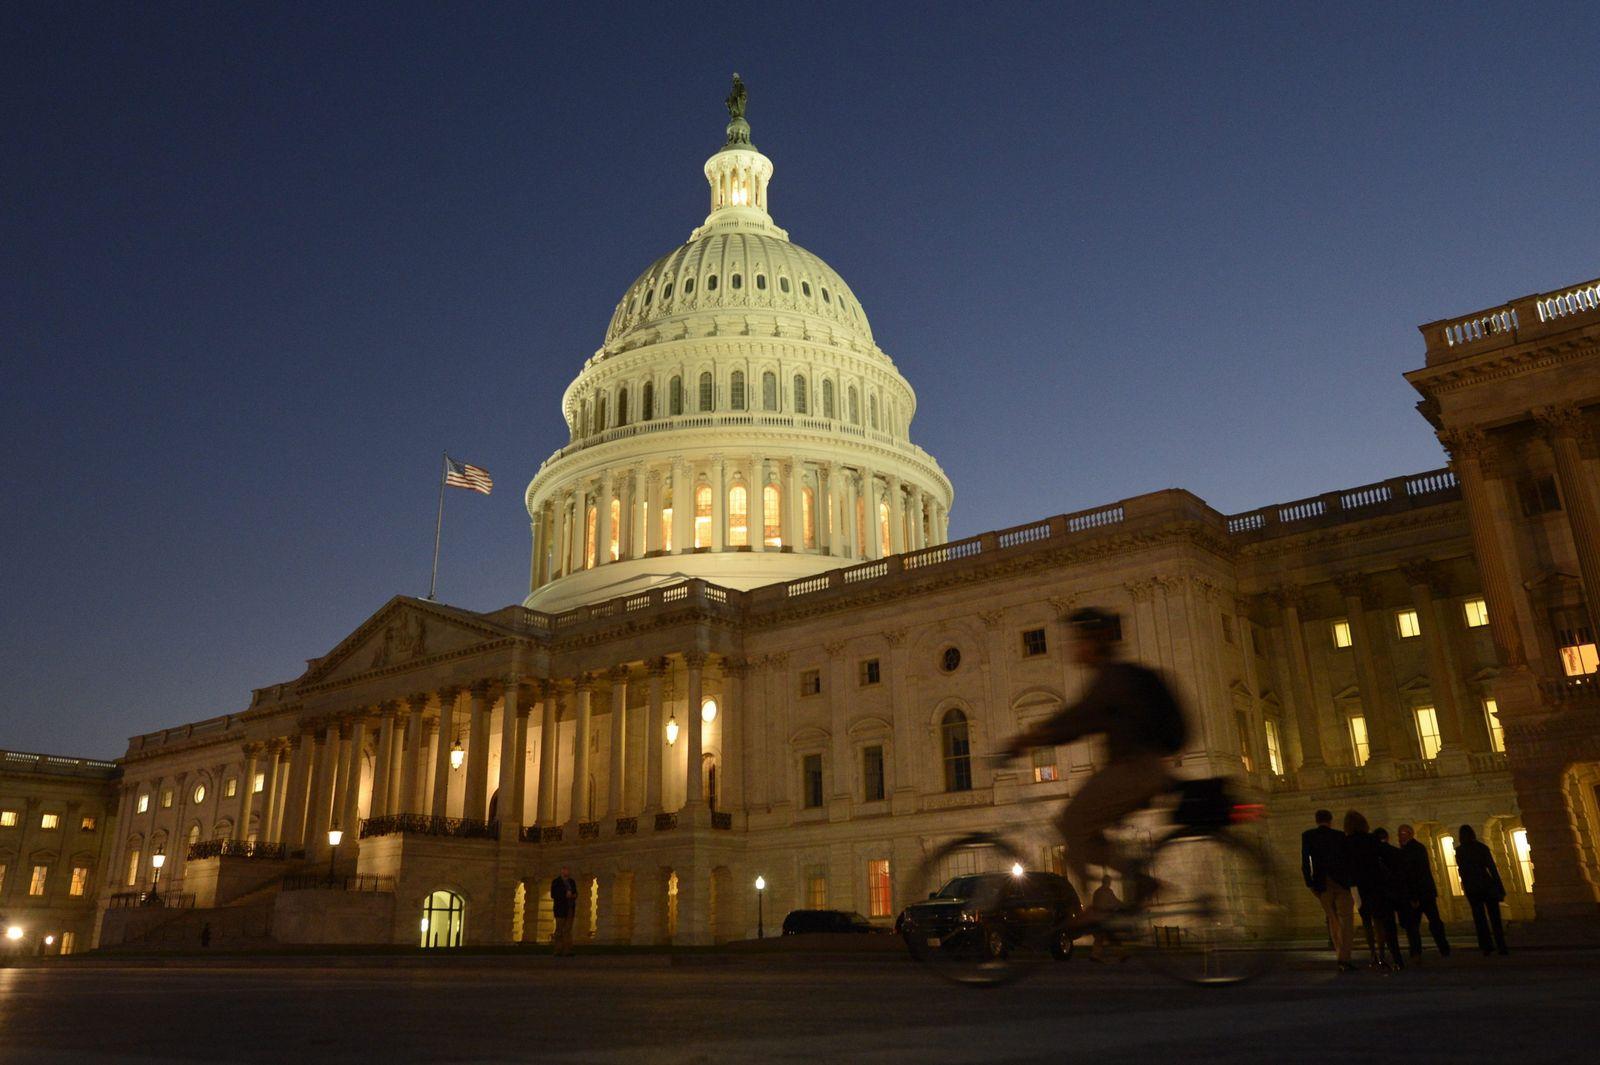 Haushaltsstreit USA / Capitol Washingto / Shutdown